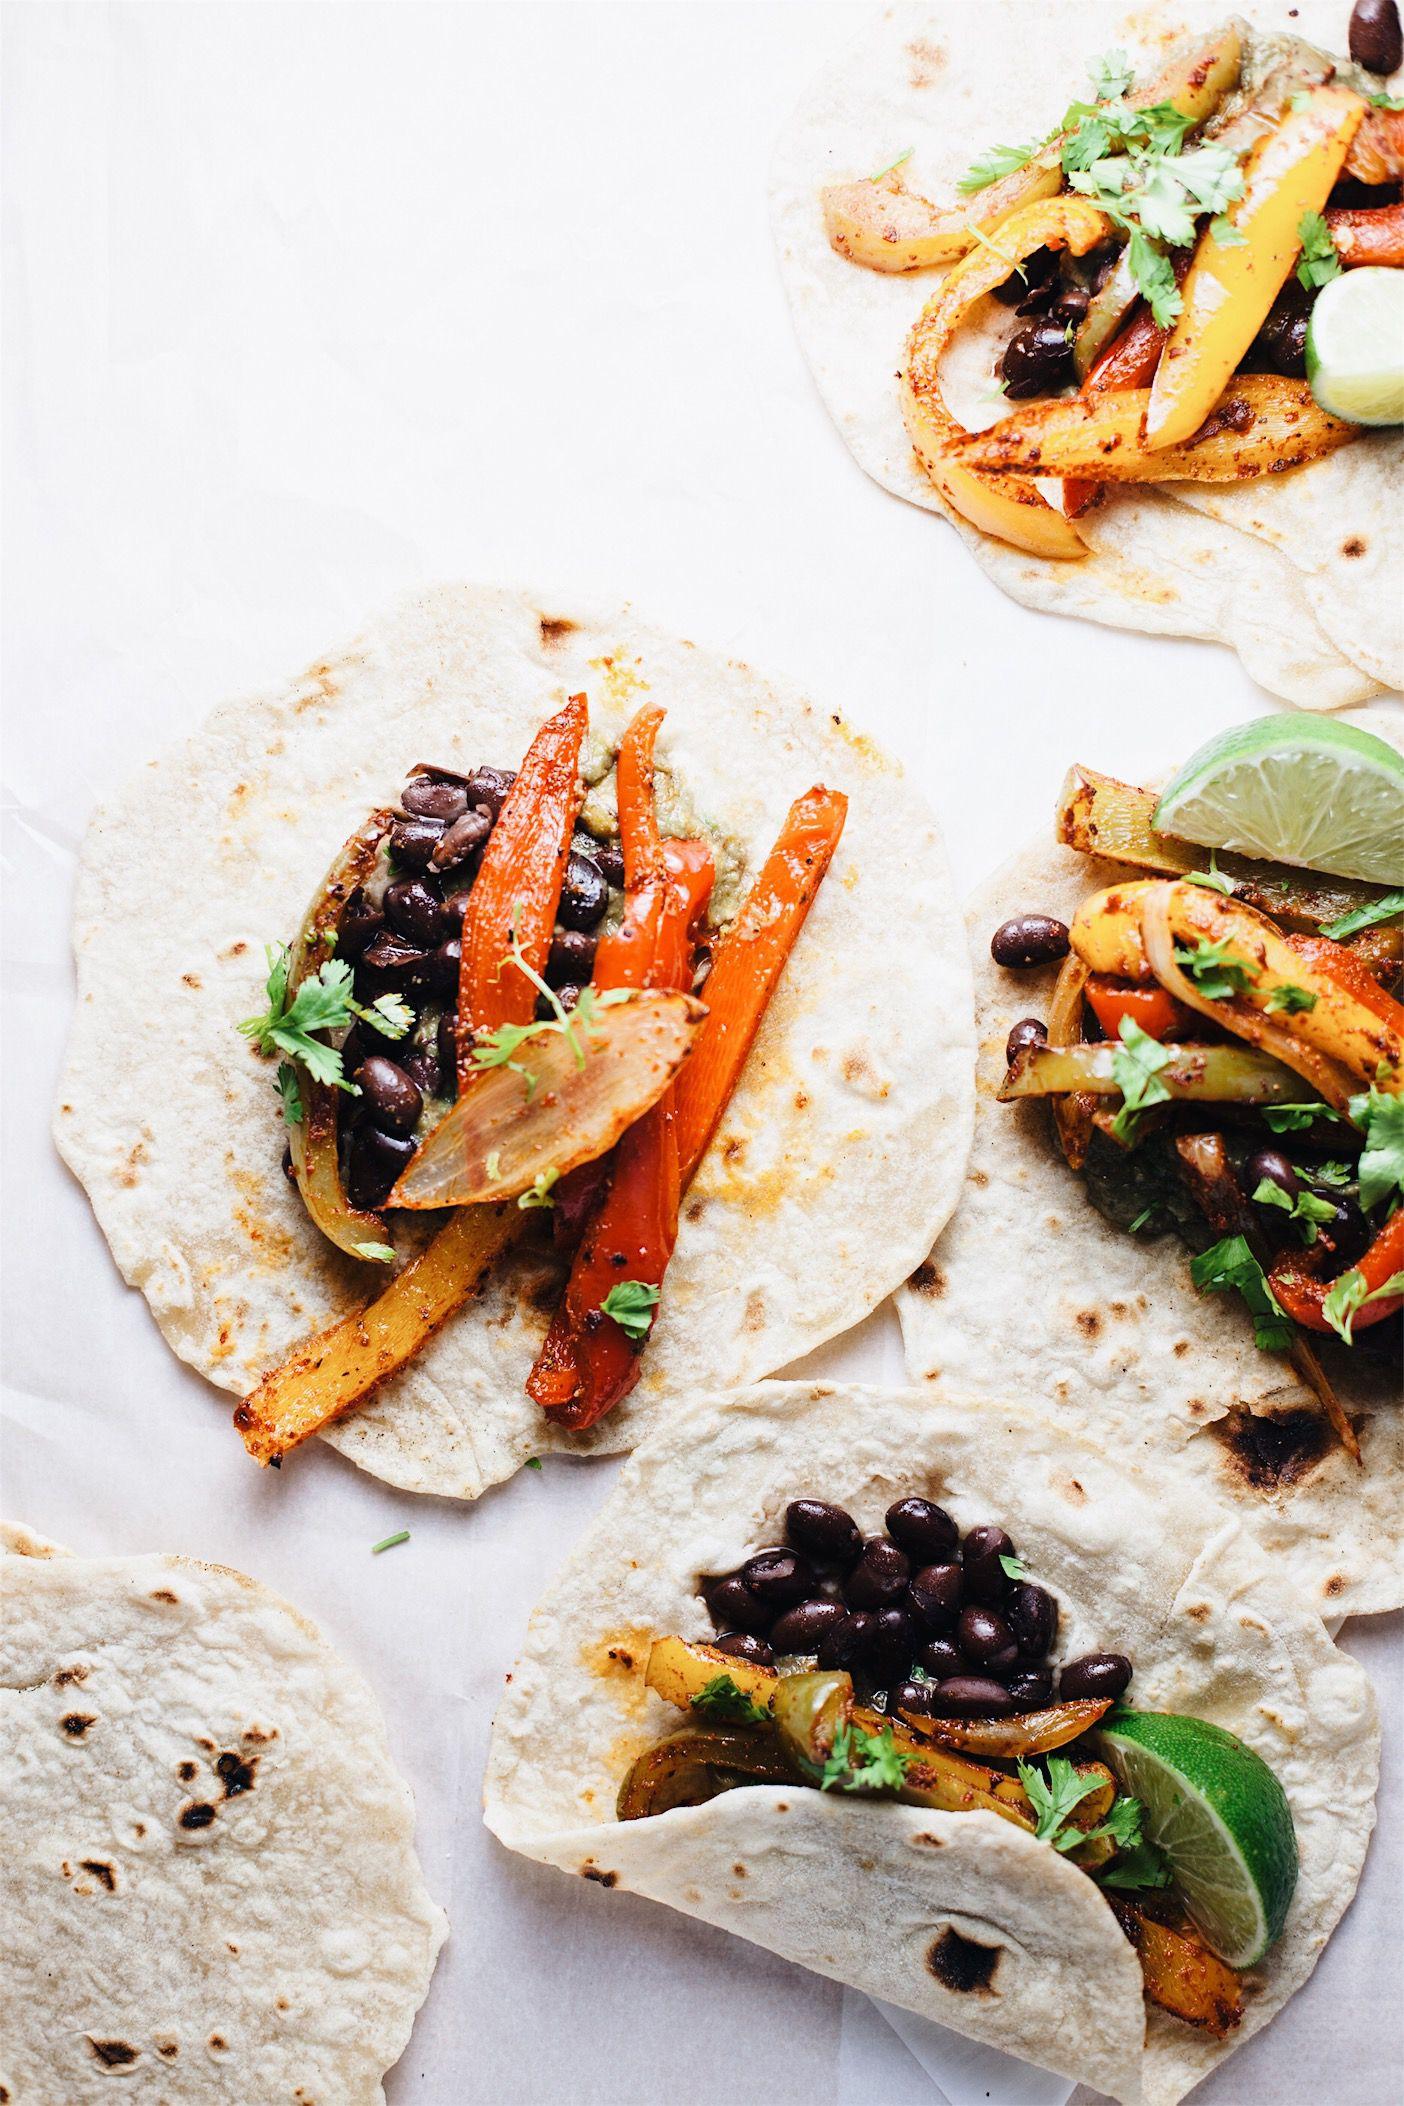 The Best Ever Vegetarian Fajitas A Simple Palate Recipe Vegetarian Fajitas Fajita Recipe Vegetarian Fajita Recipes